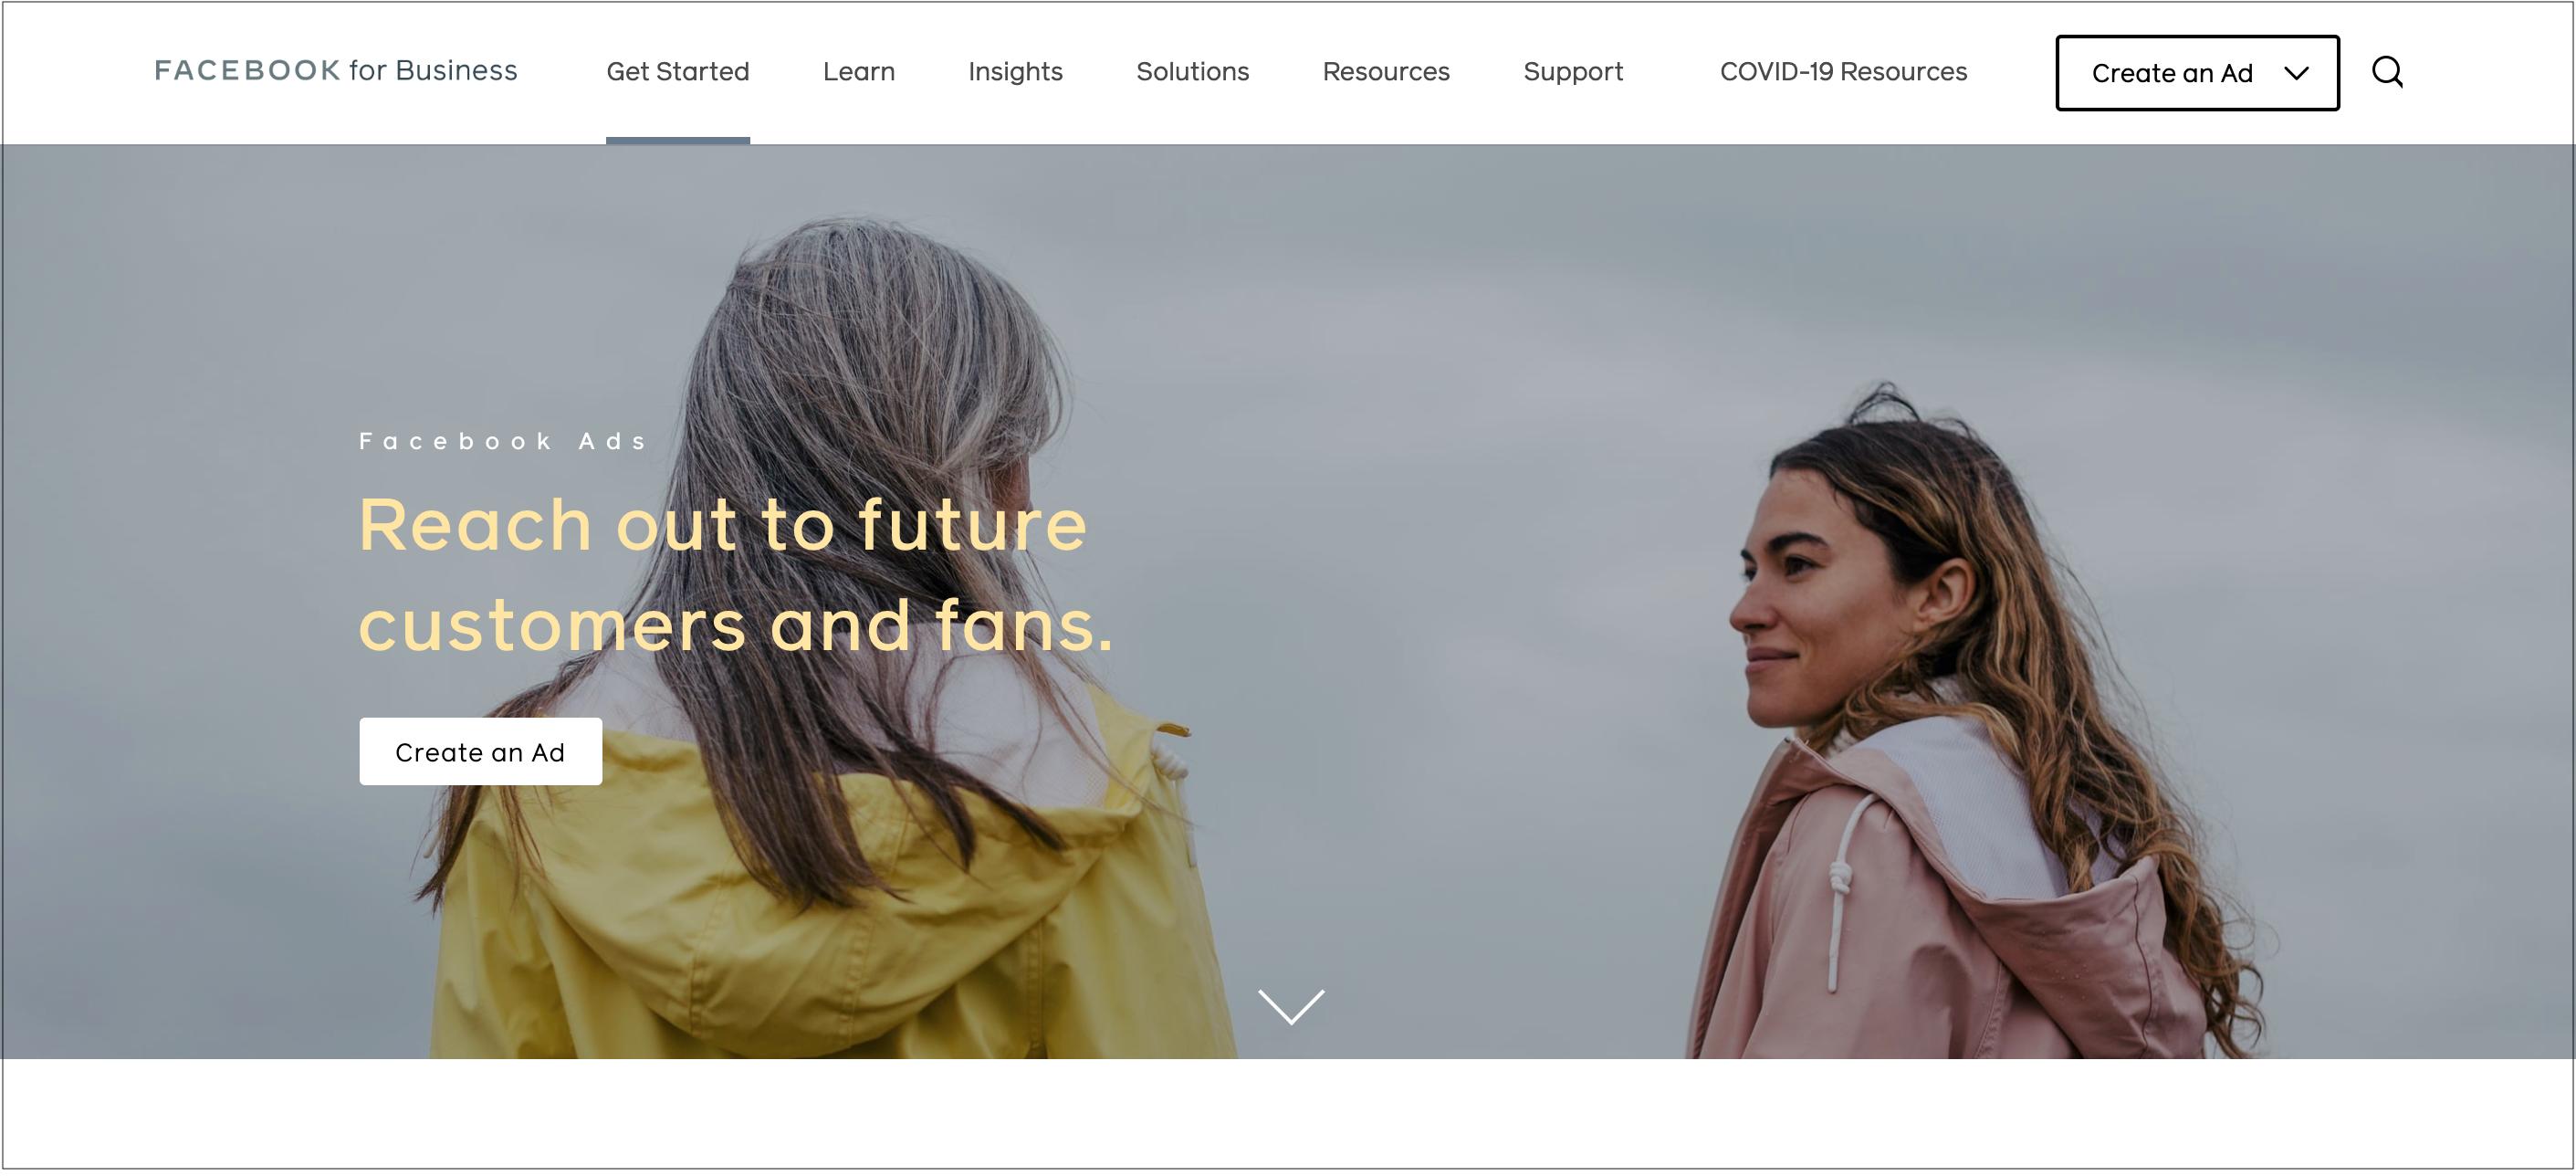 Facebook Ads webpage